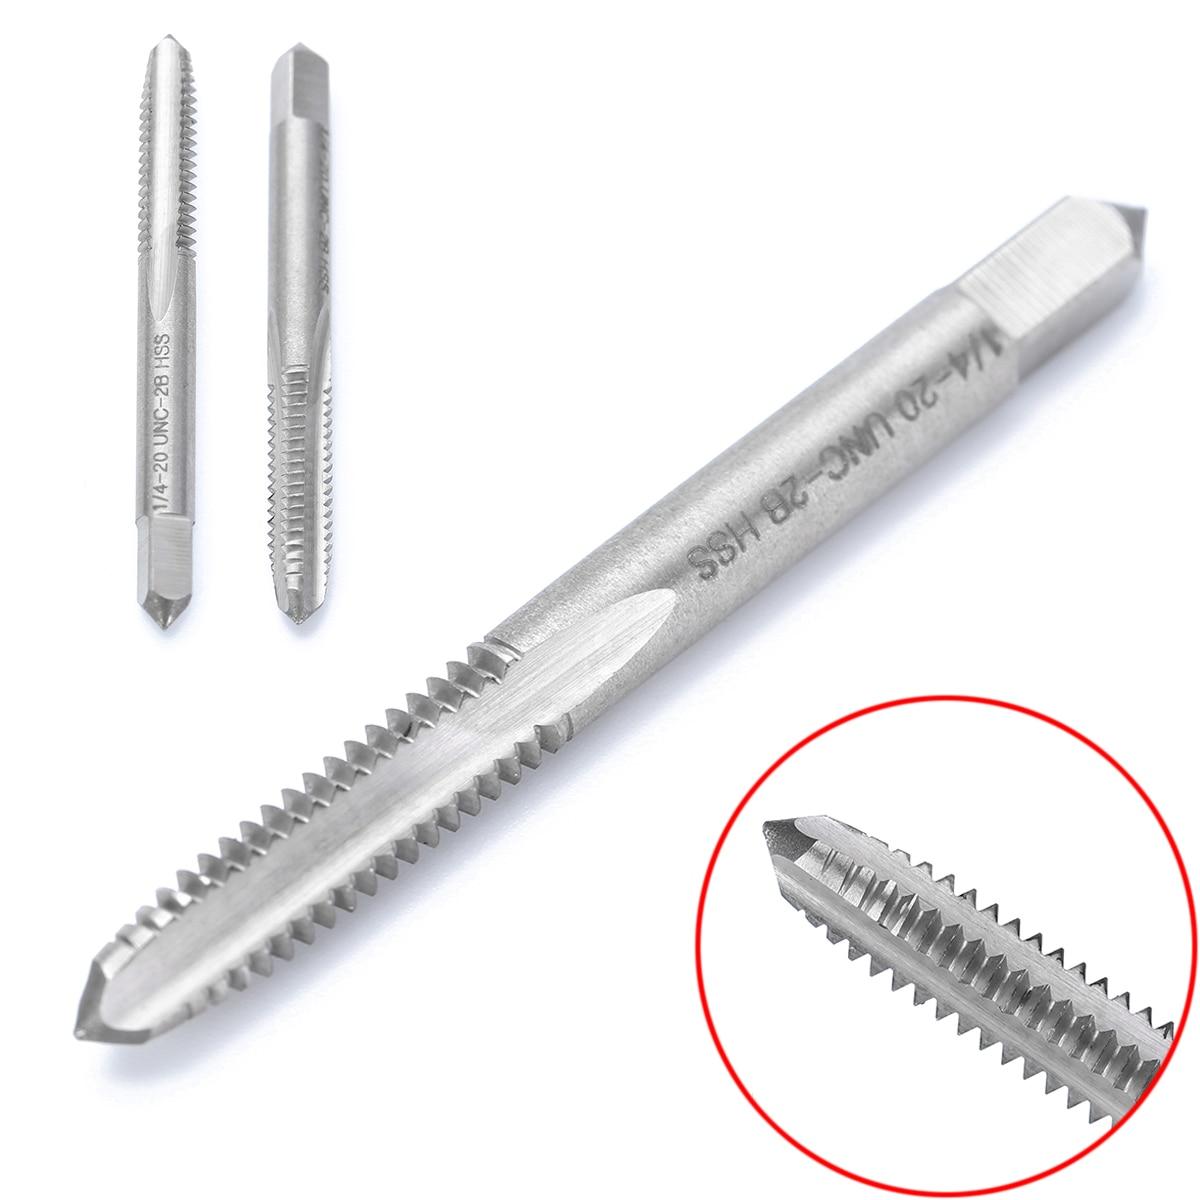 1pc HSS Machine 1 1//4-20 UN Plug Tap and 1pc 1 1//4-20 UN Die Threading Tool